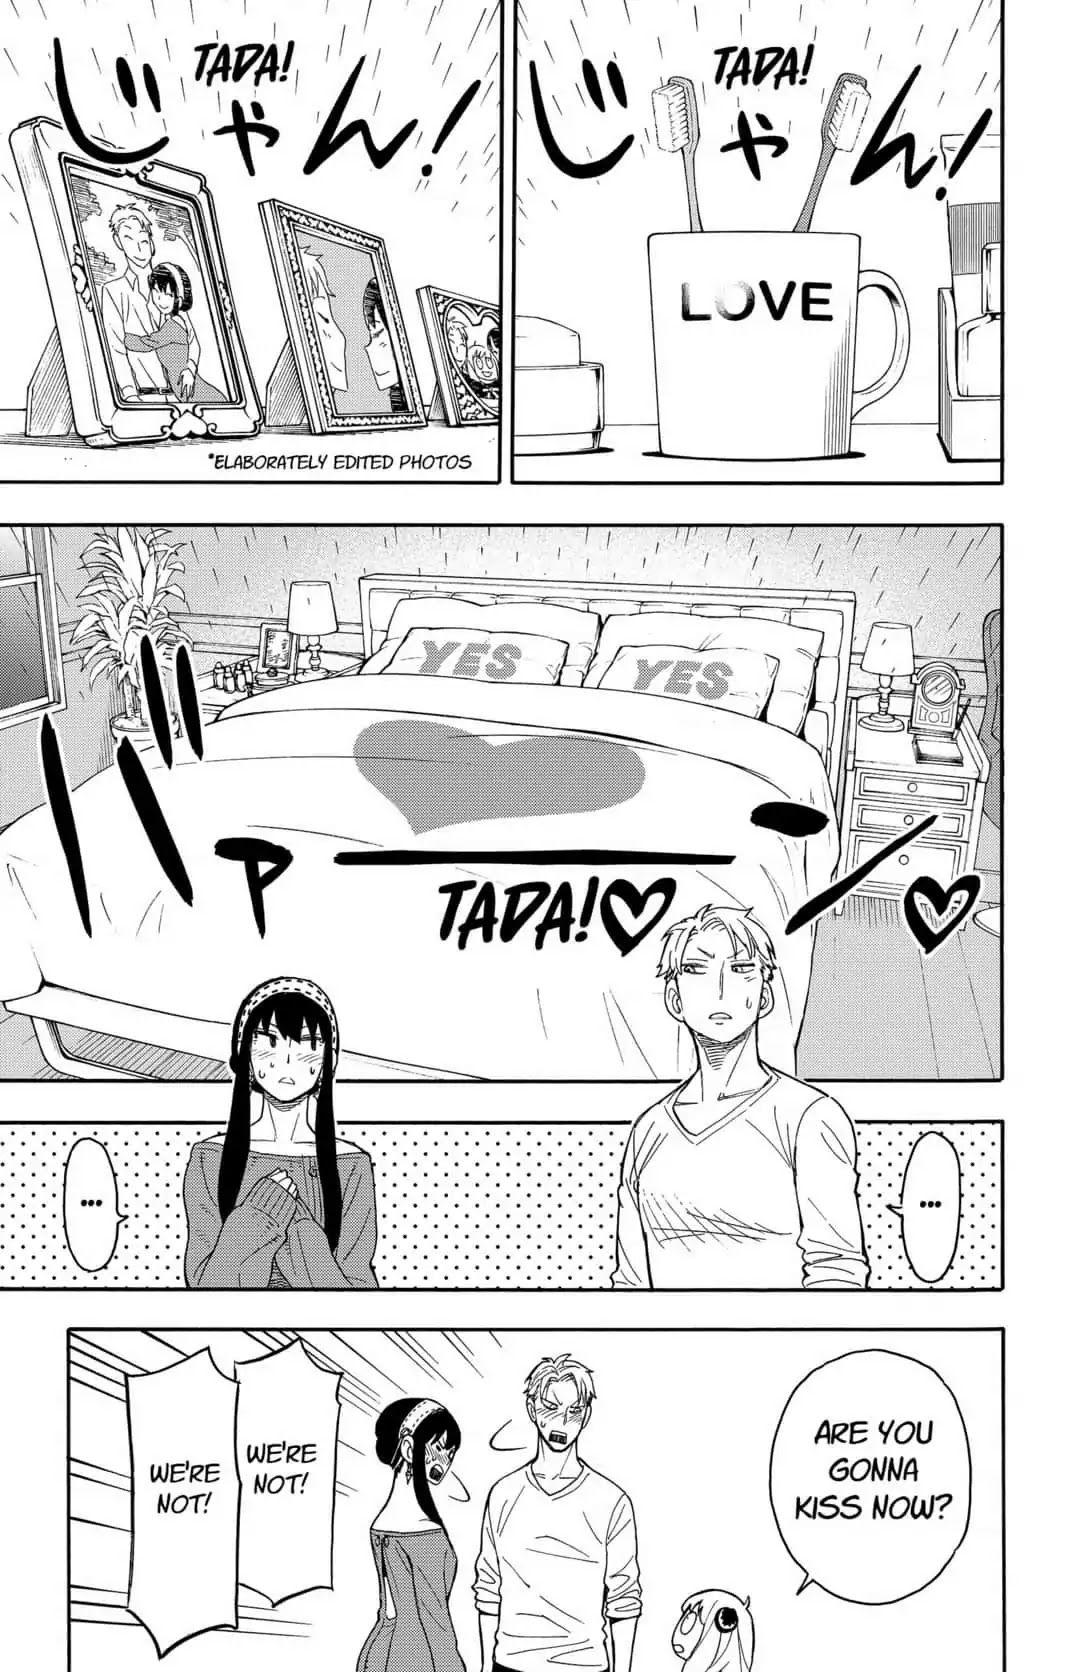 Spy X Family Chapter 11 Mission 11 Page 21 Manganelo Com Anime Family Literature Circles Strange Family